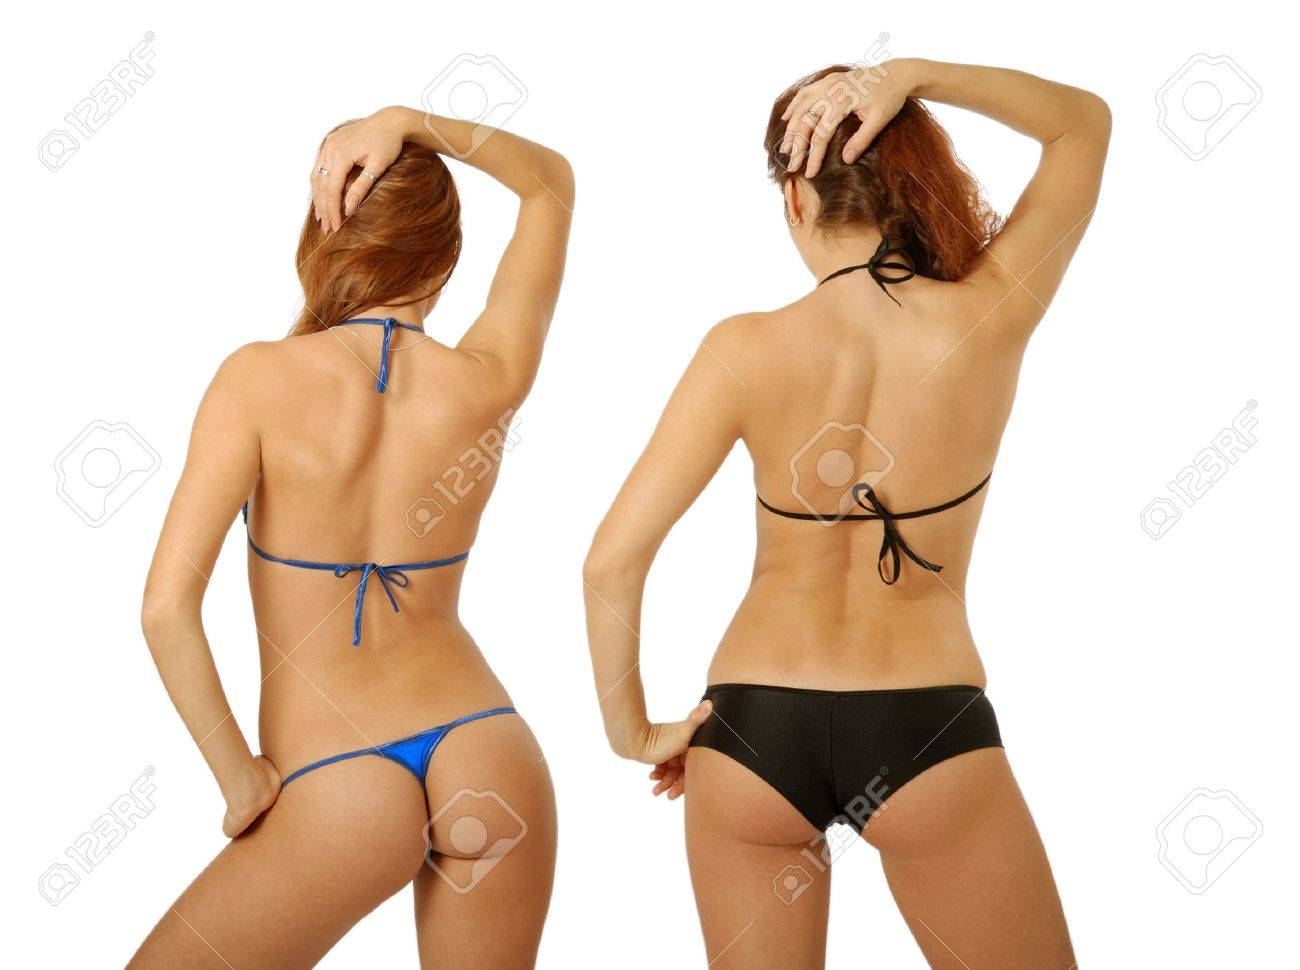 Fucking kerala girls pics